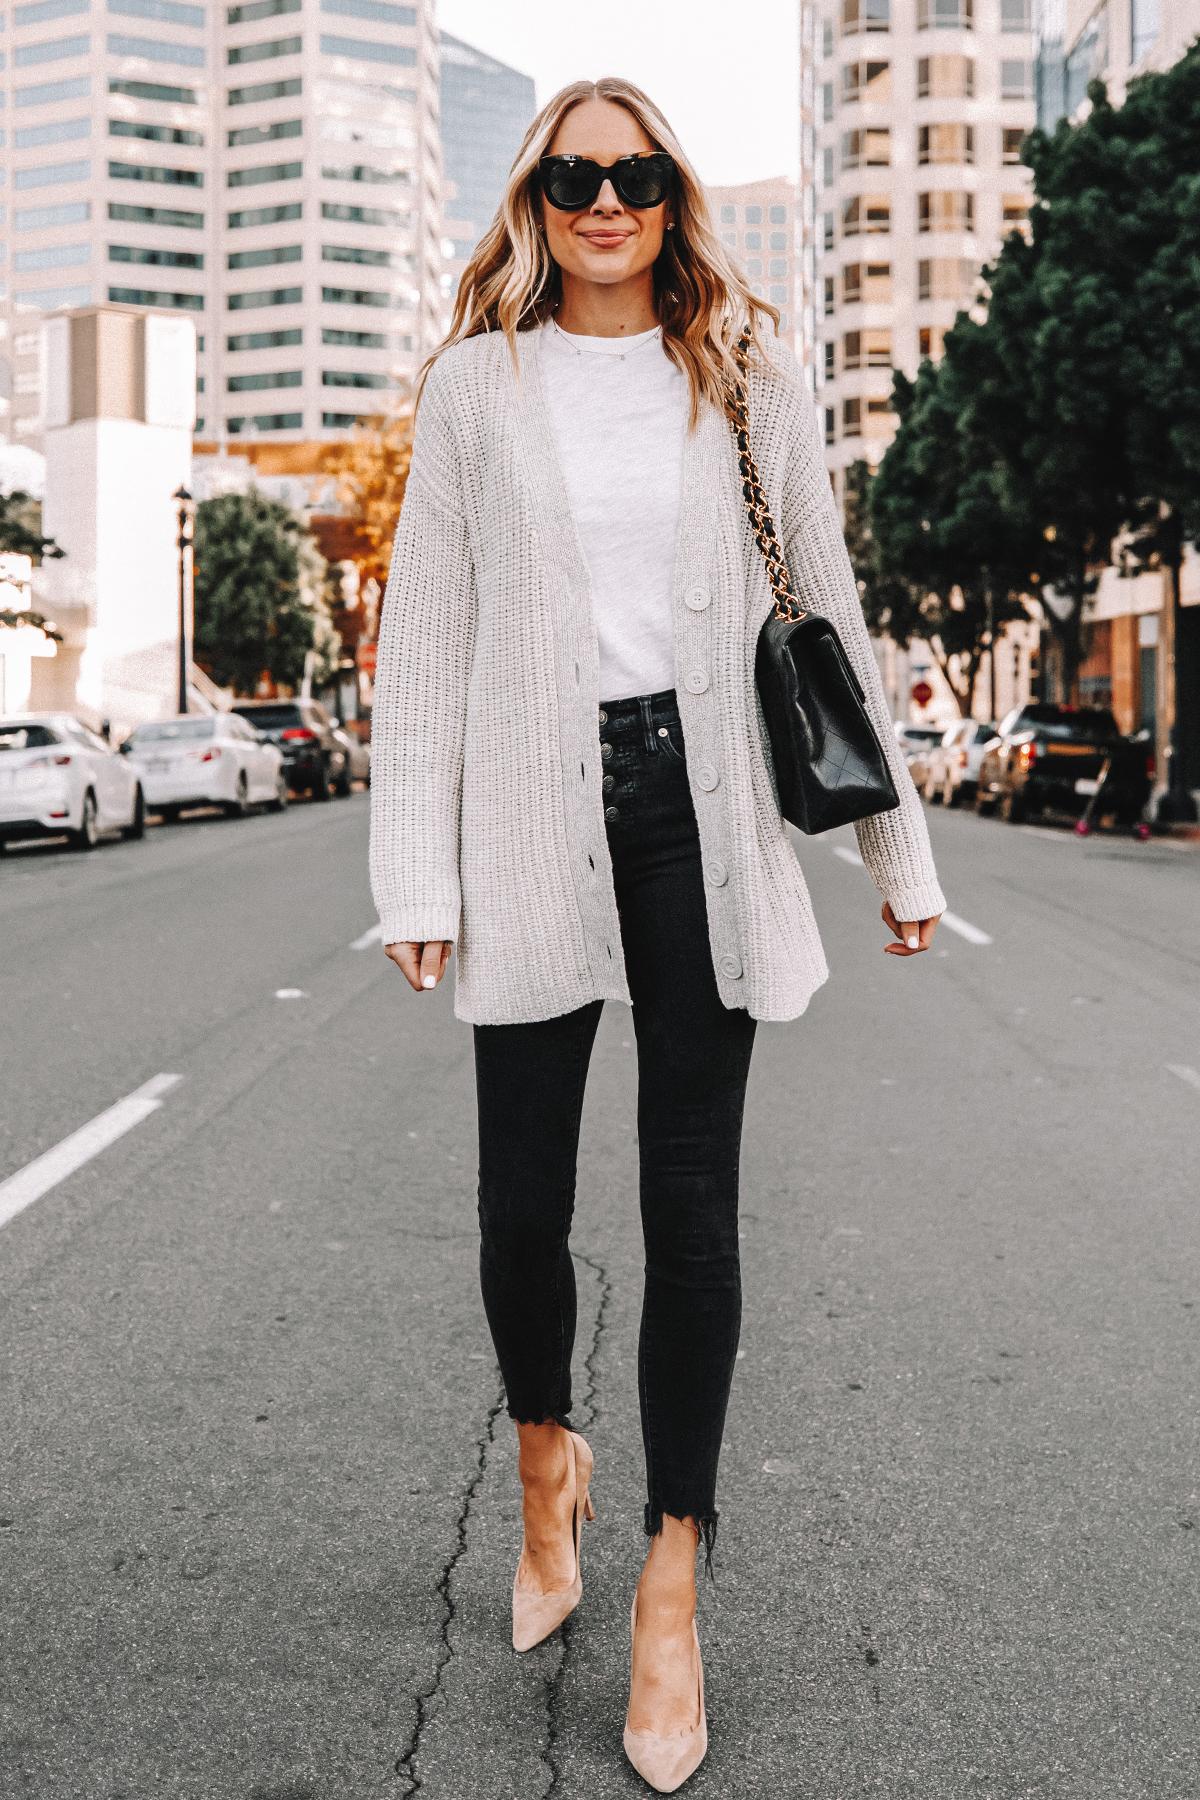 Fashion Jackson Wearing Oversized Chunky Cardigan White Tshirt Black Skinny Jeans Nude Pumps Black Handbag